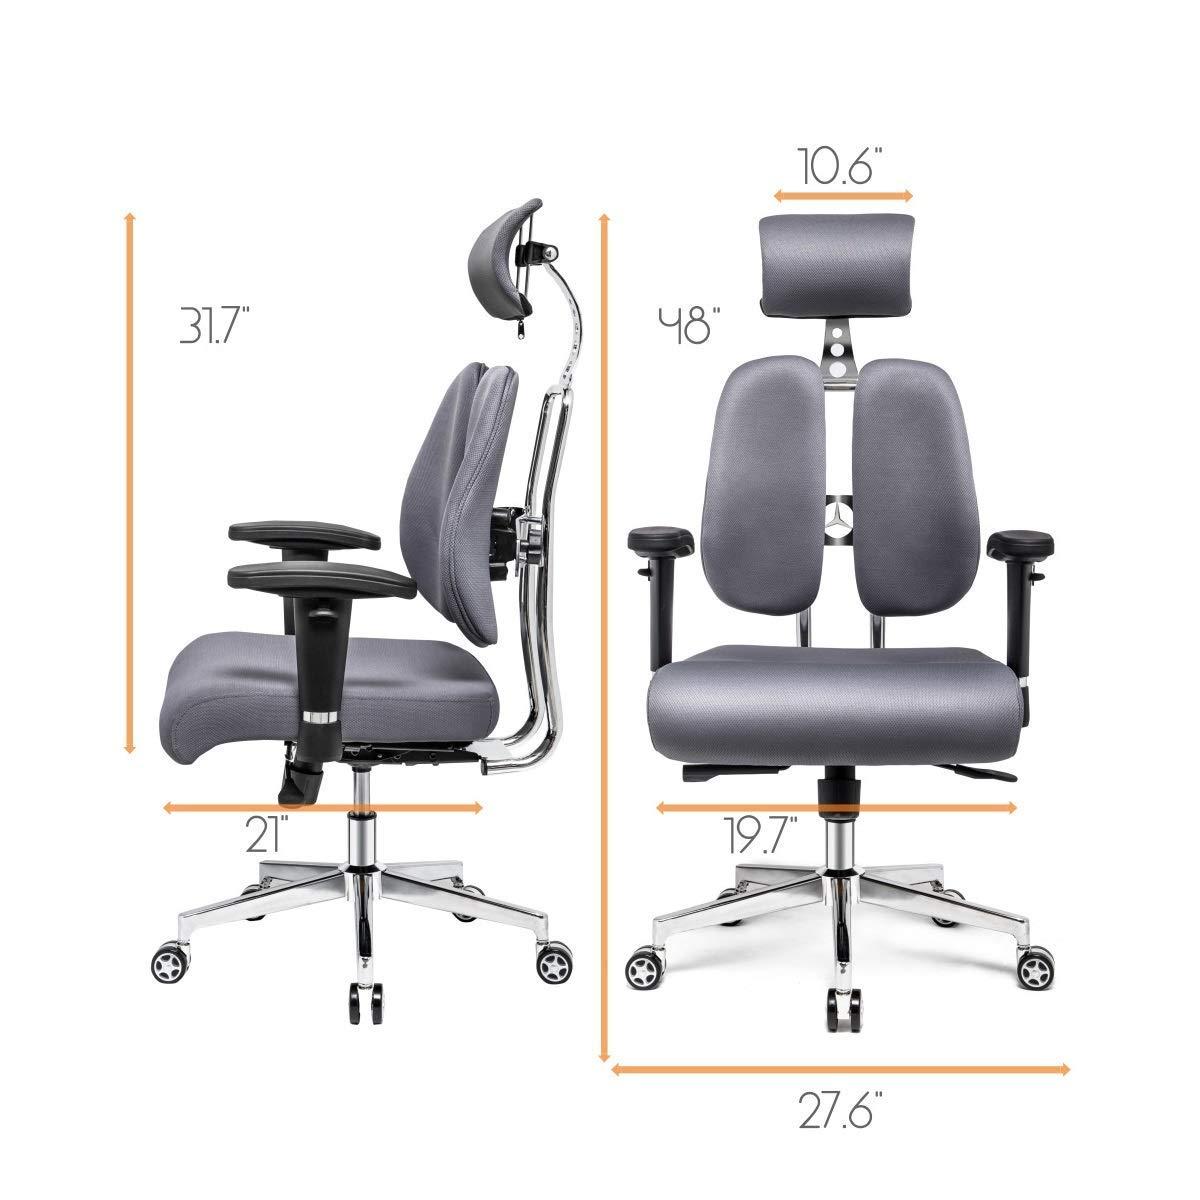 Hourseat Office Desk Chair Gray /… PU Leather Ergonomic Office Chair Lumbar Support Desk Executive Chair Adjustable Headrest Backrest